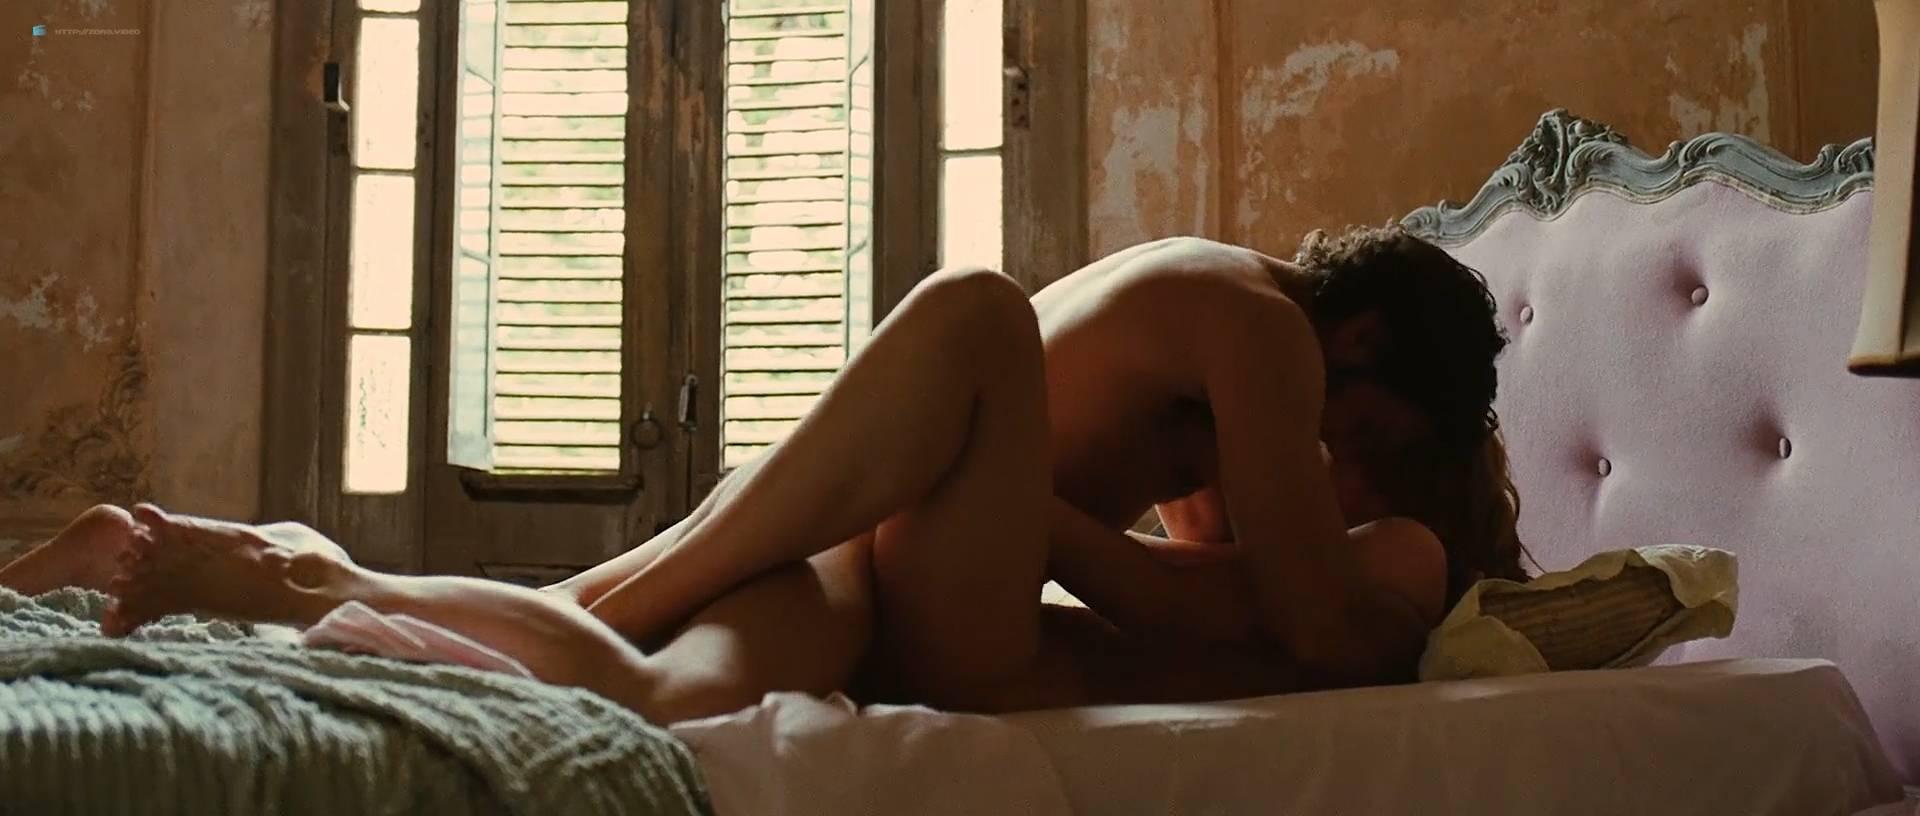 Louise Bourgoin nude and pregnant in - Unheureux événement (FR-2011) HD 1080p (17)